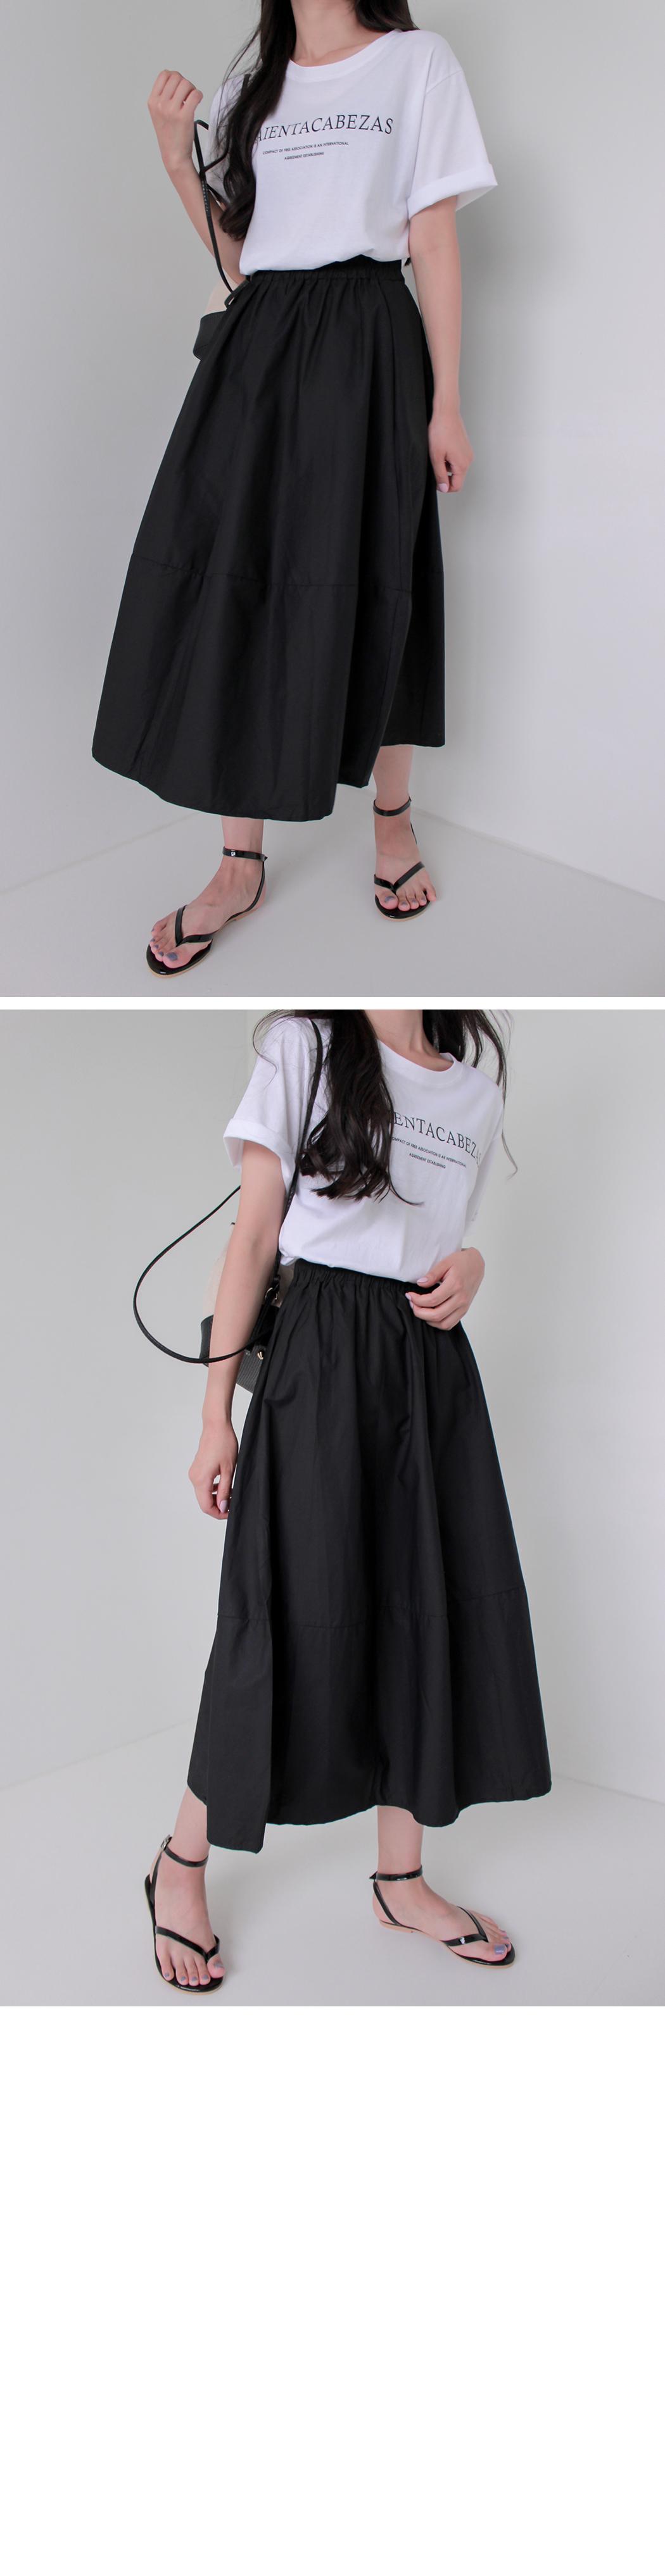 Hepa Skirt